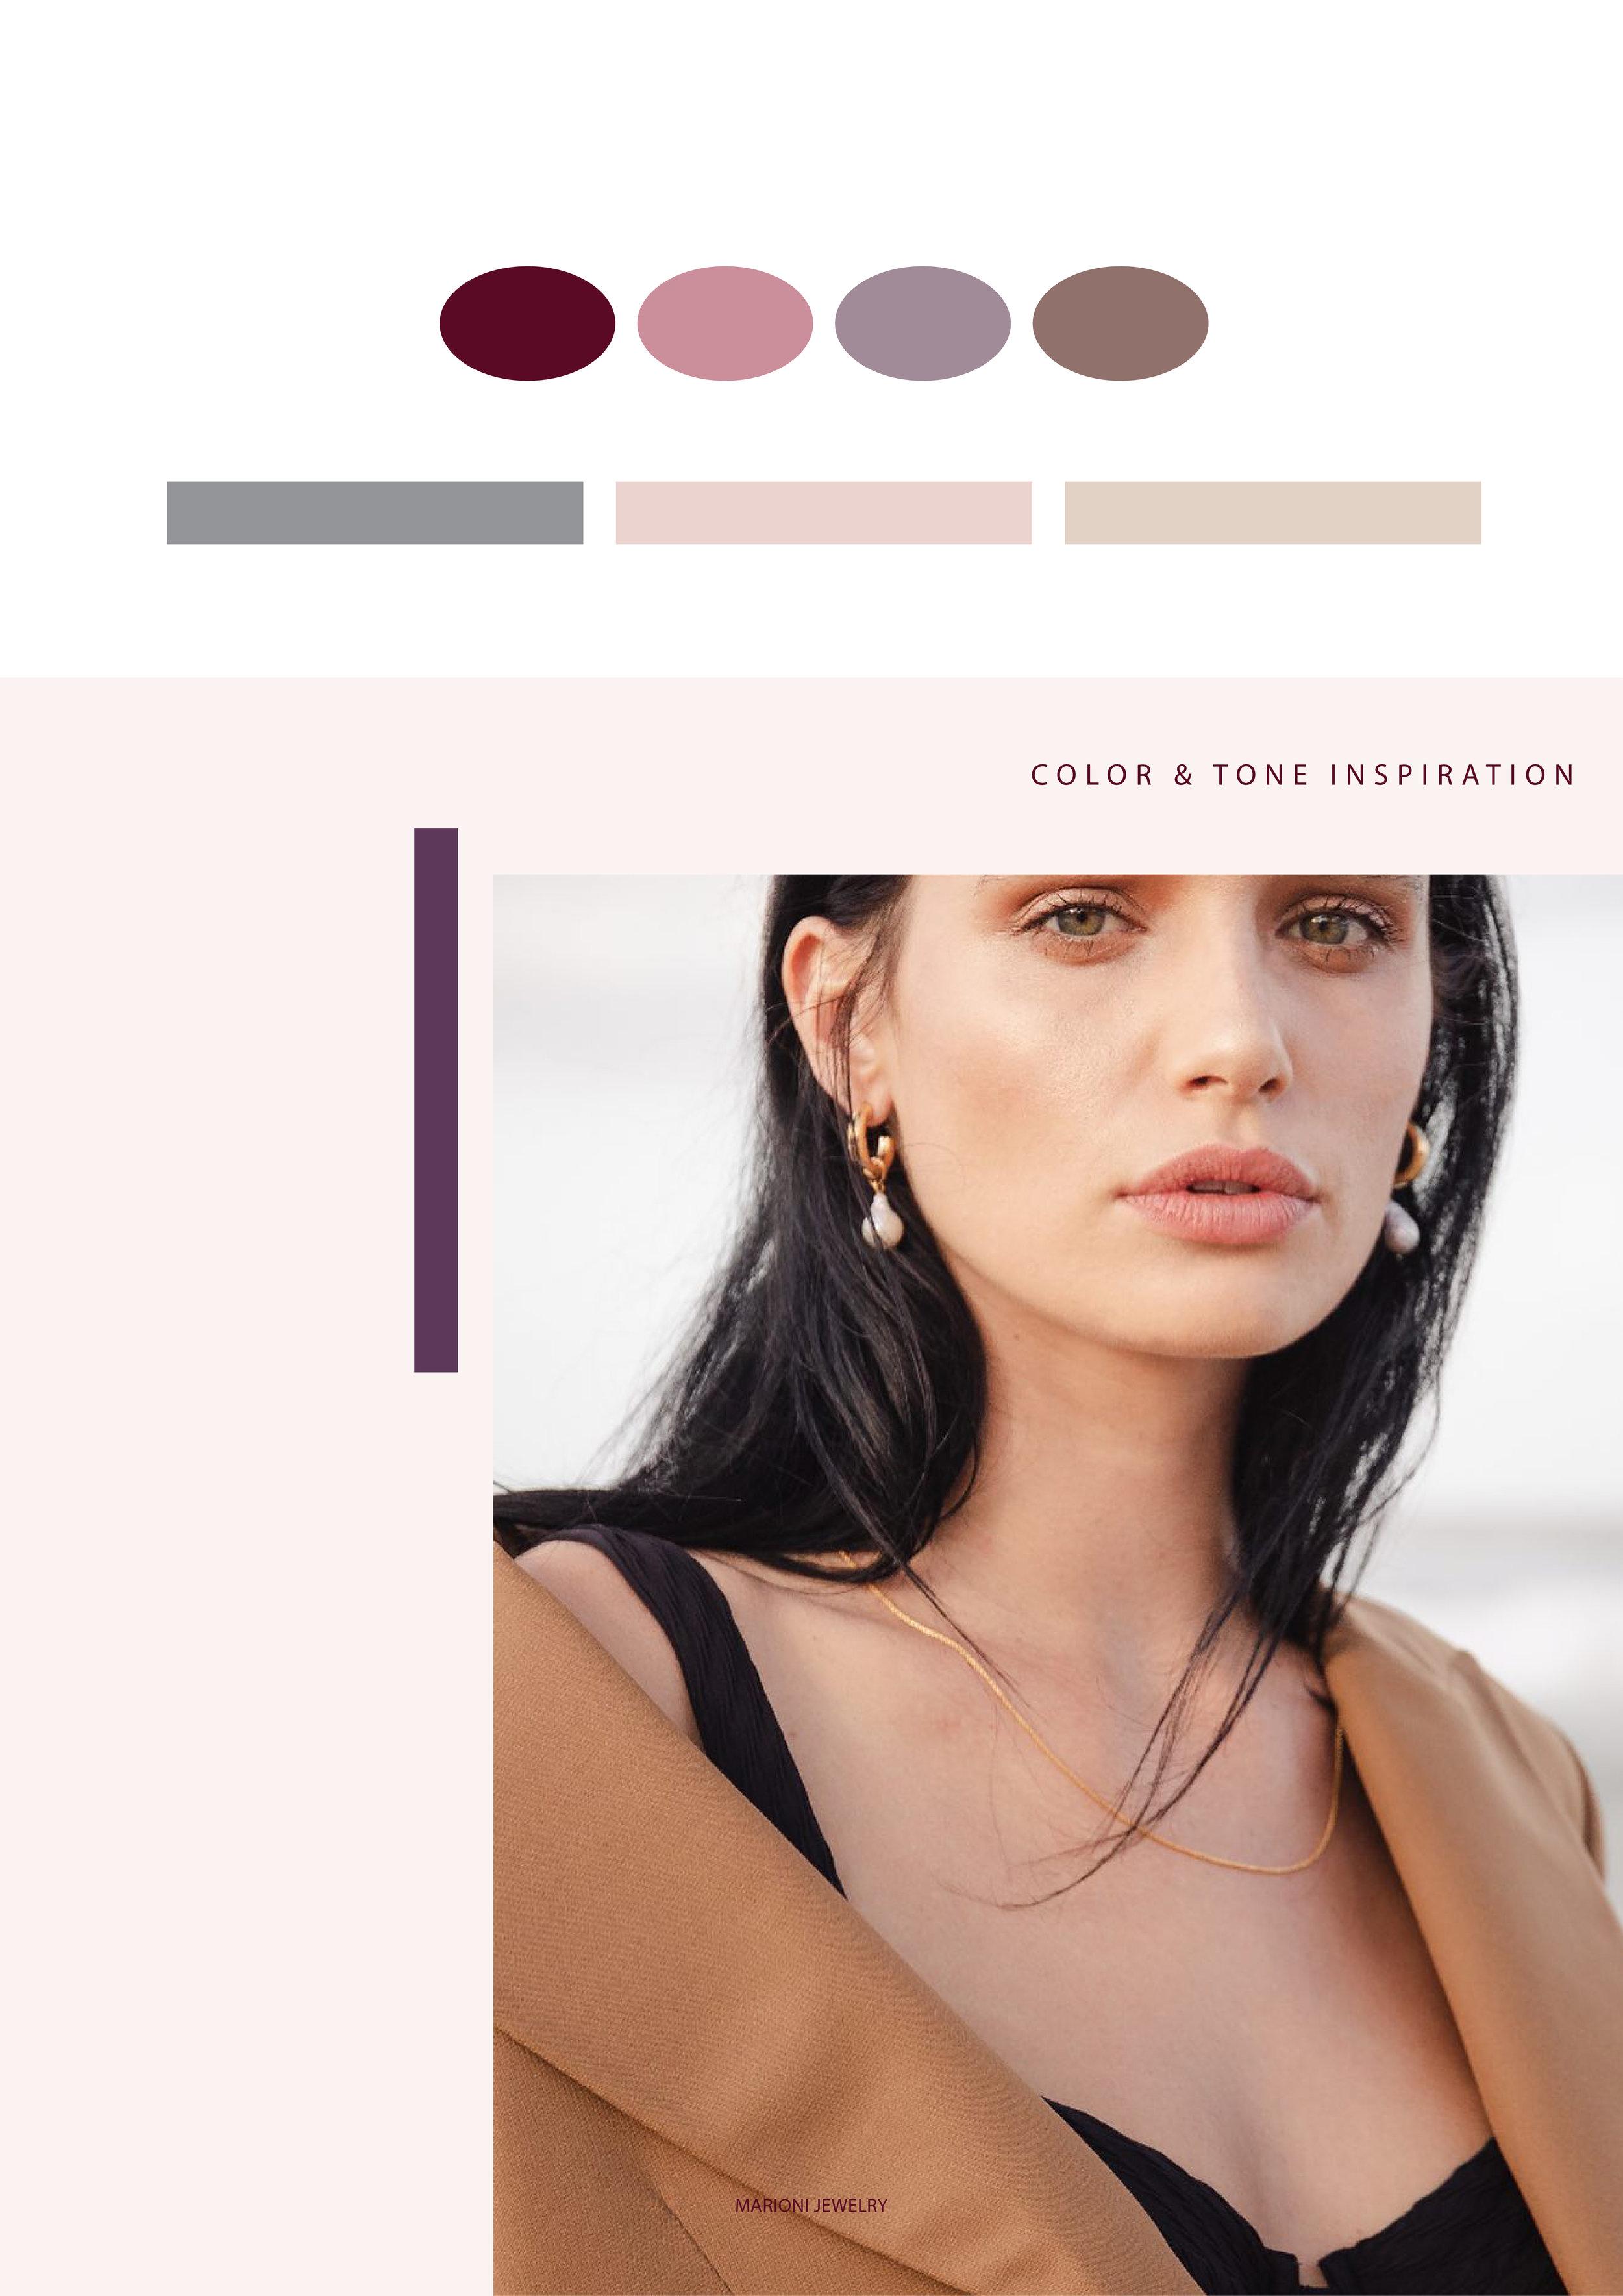 Marioni_Jewelry_Lookbook11.jpg